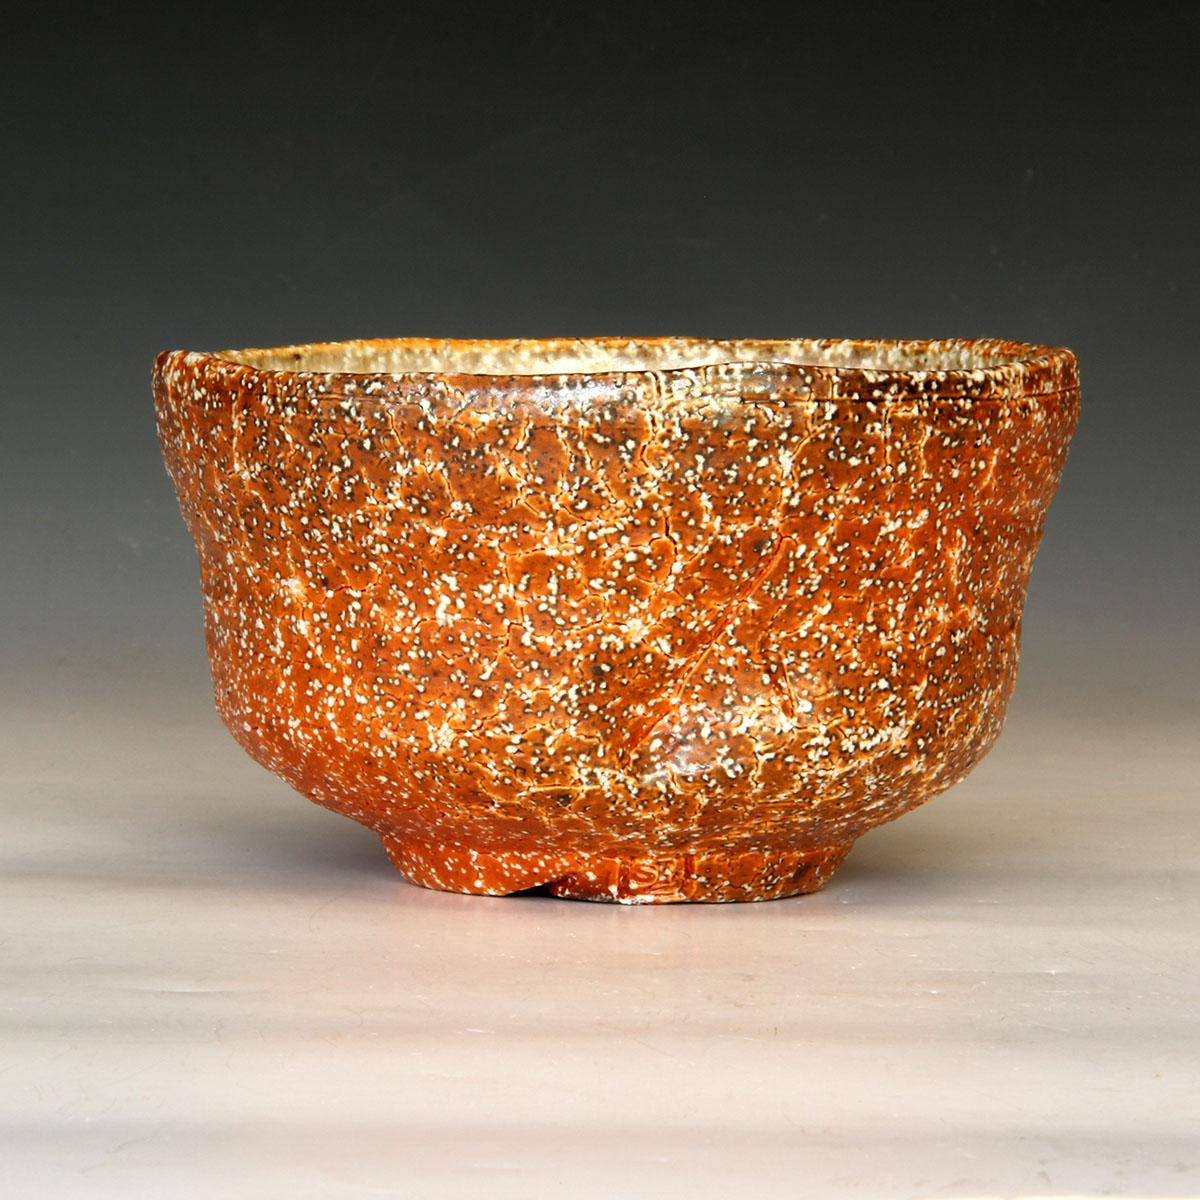 1f. Sandy Lockwood - Teabowl 6 - 13.5 x 8cm - woodfired and salt glazed stoneware - 2018 -IMG_1942 (2).jpg